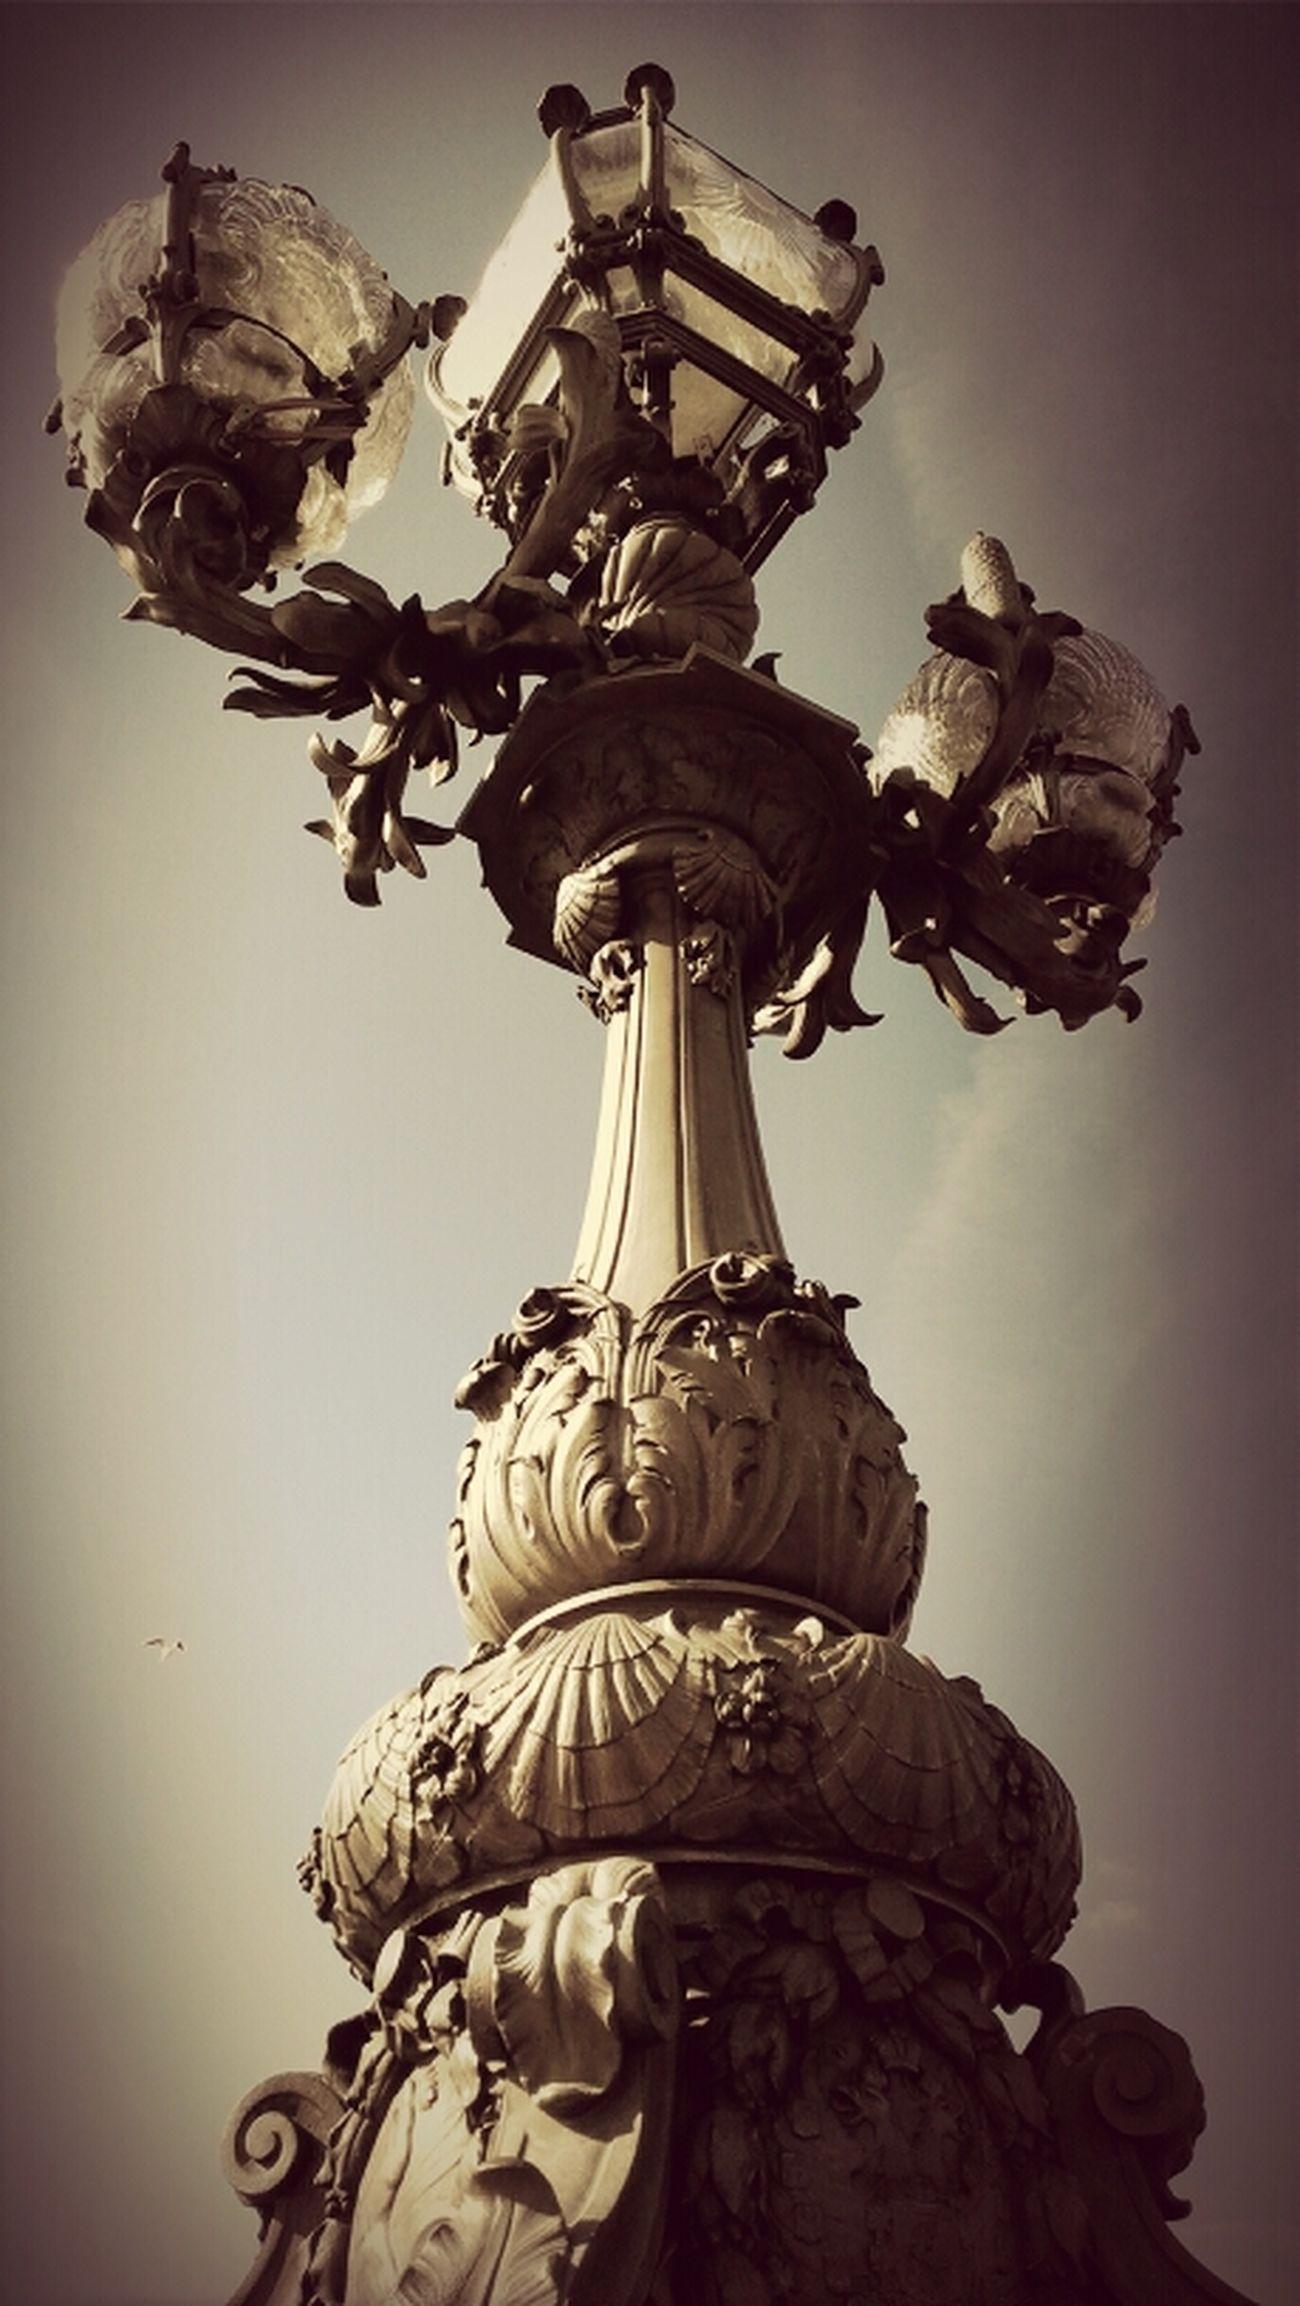 Architecture Streetphotography Lamp Lampadaire Lampadairophile